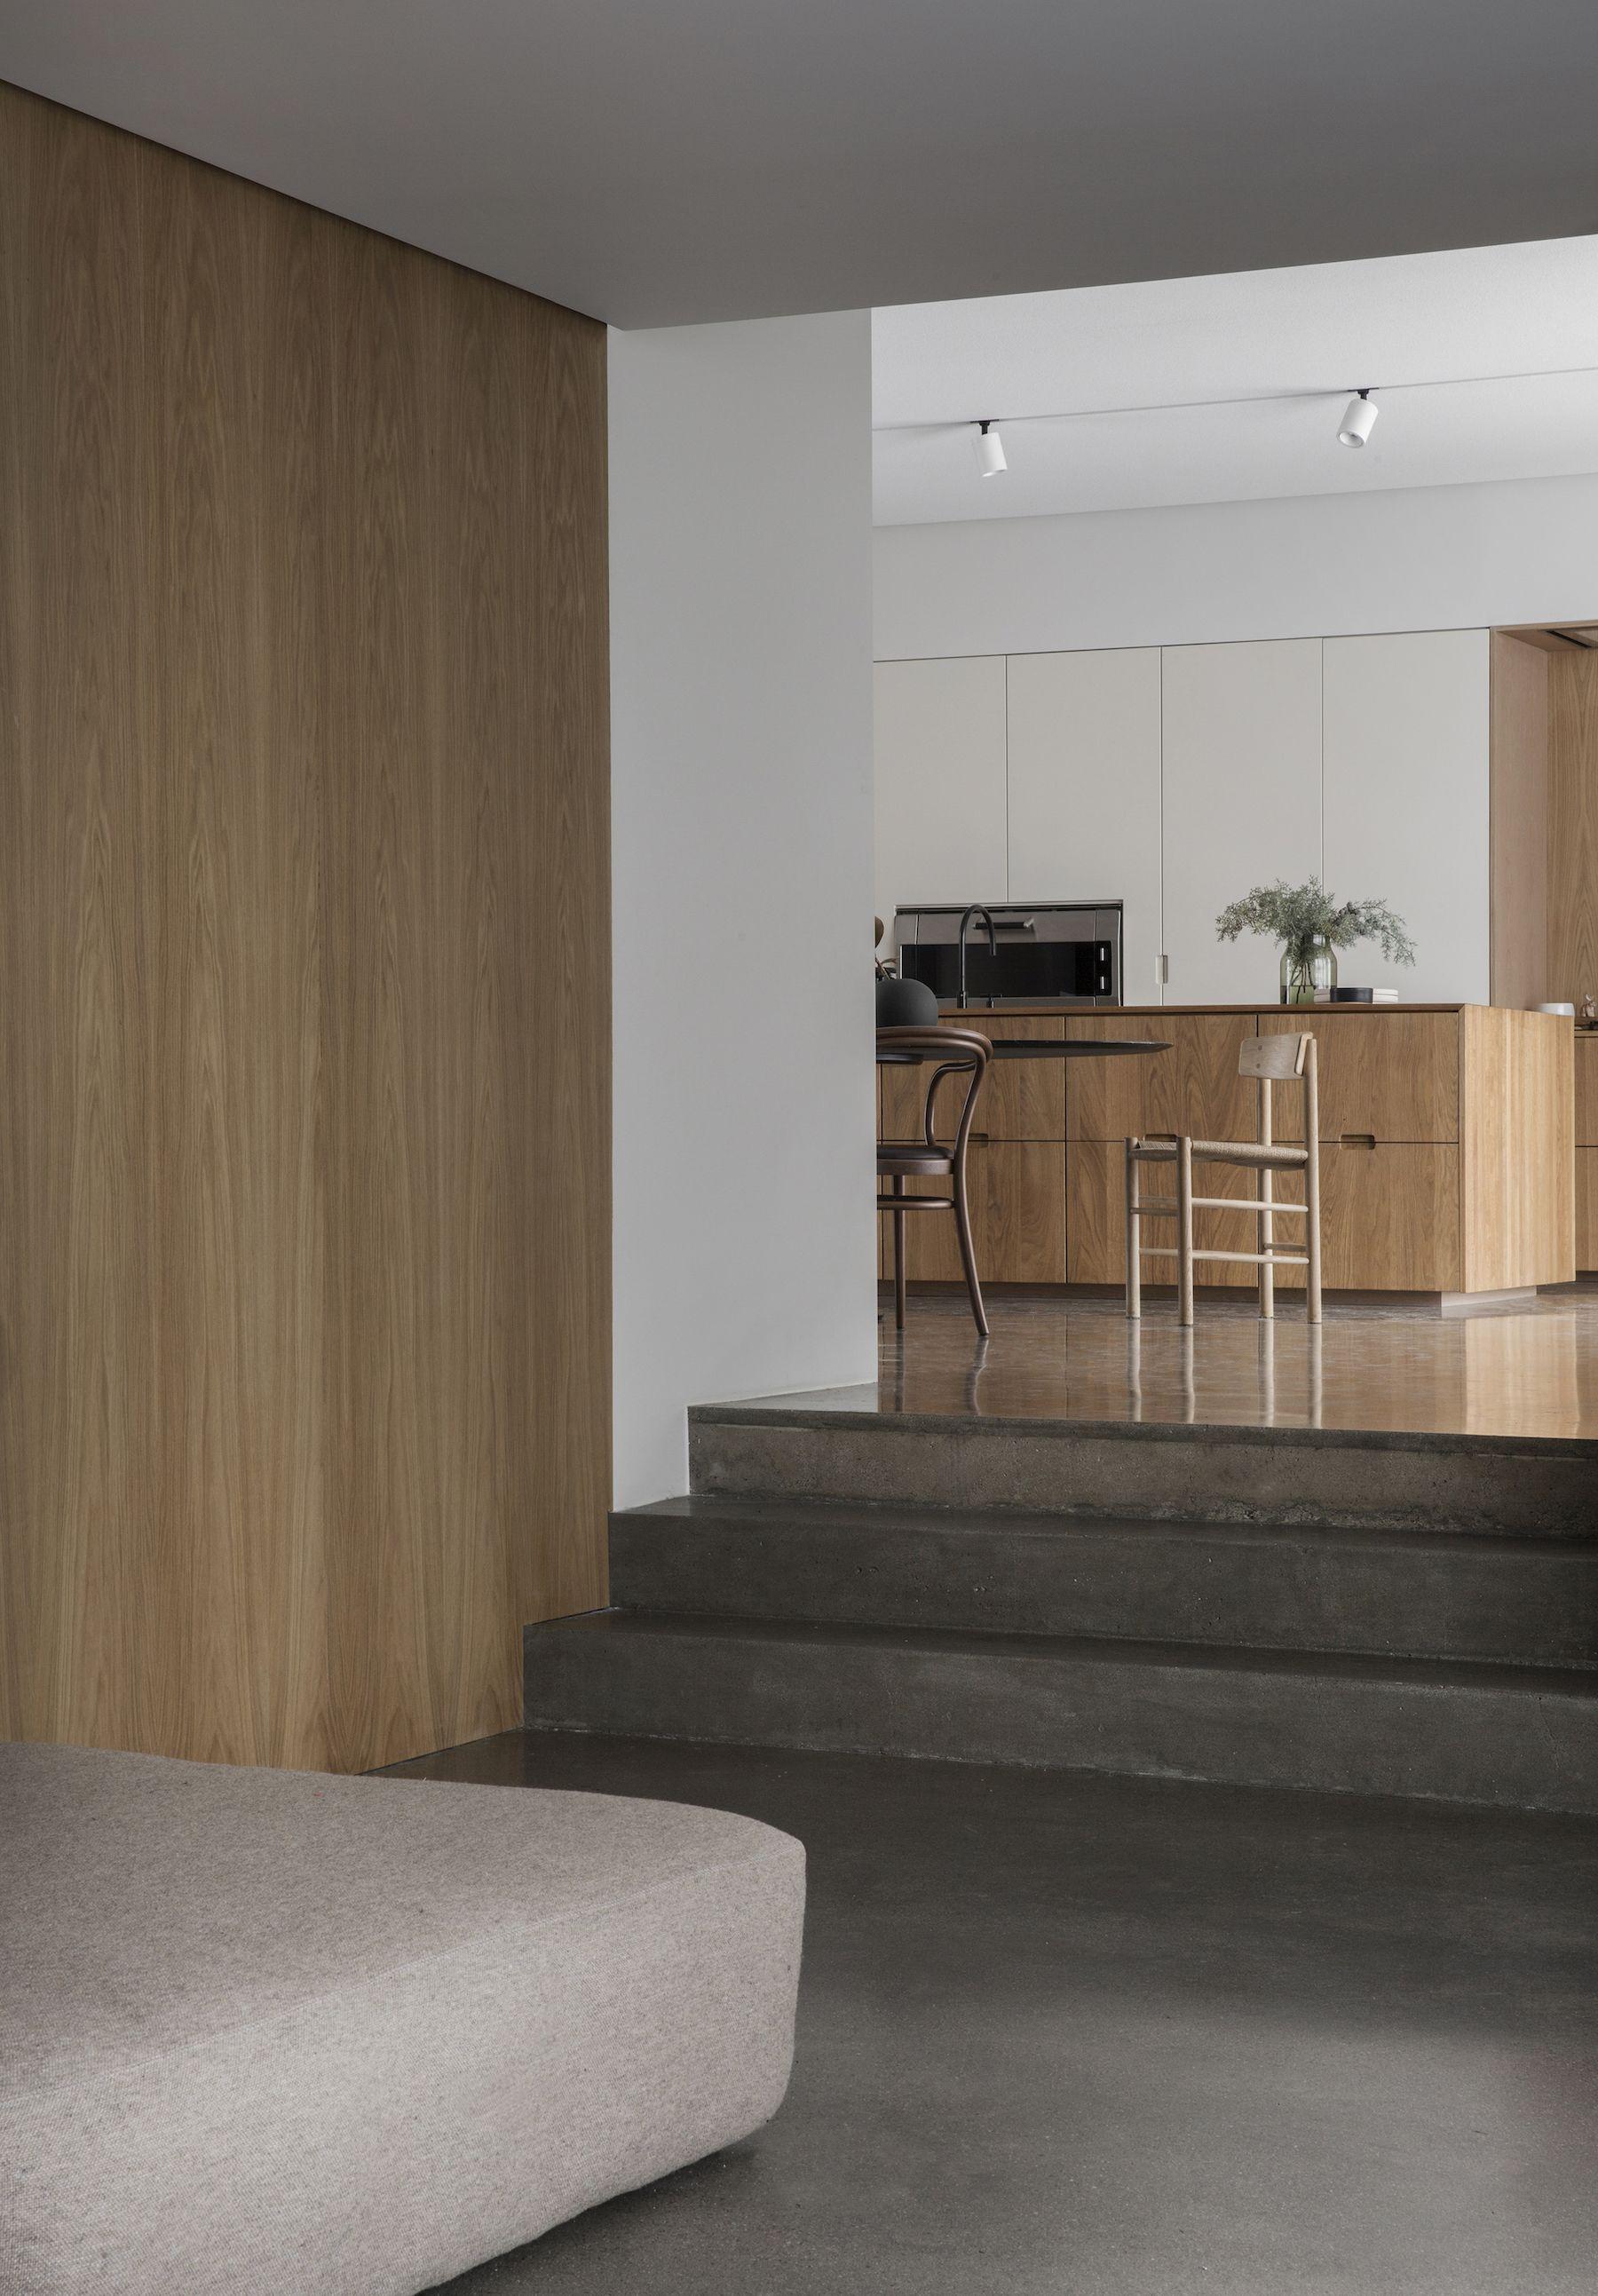 The gj vik house decoraci n muebles dise o interiores for Casa minimalista interior cocina